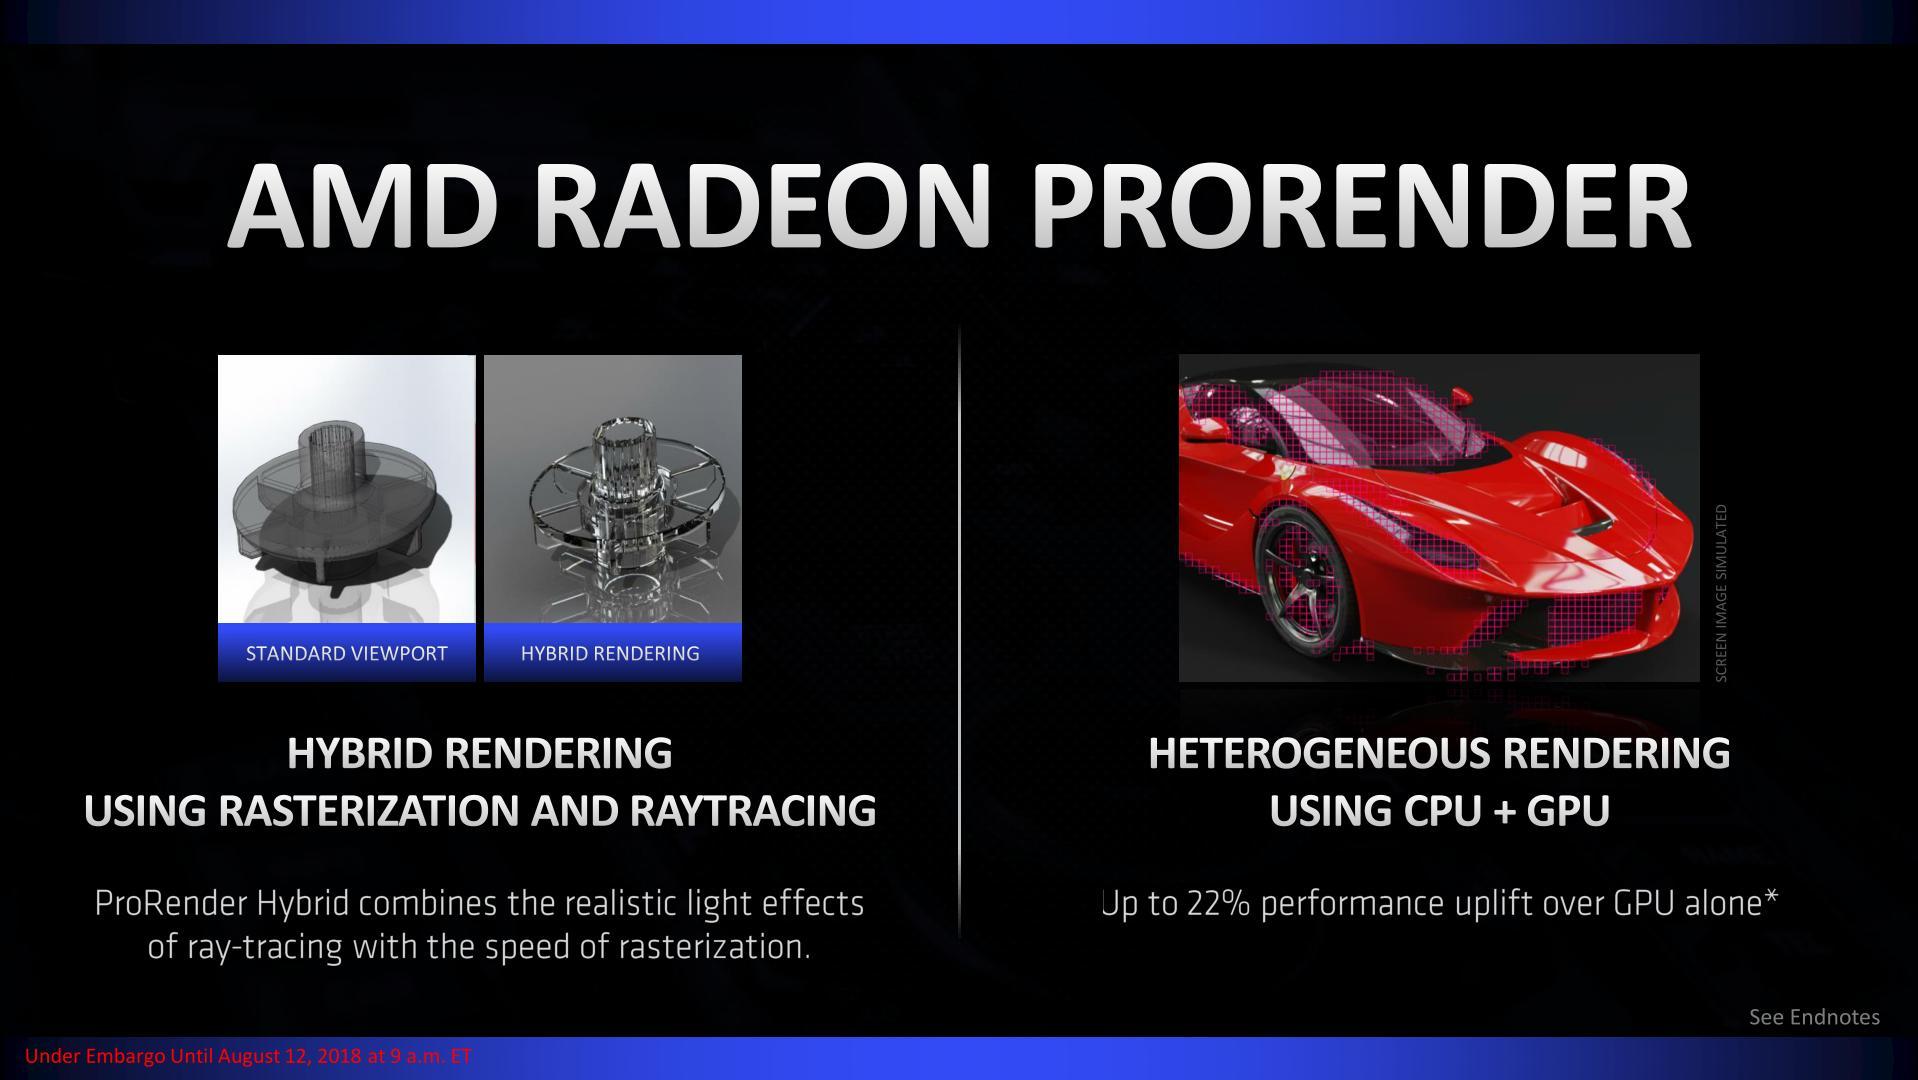 912861676_AMDRADEONPROPressDeck_FINAL(1)_11.jpg